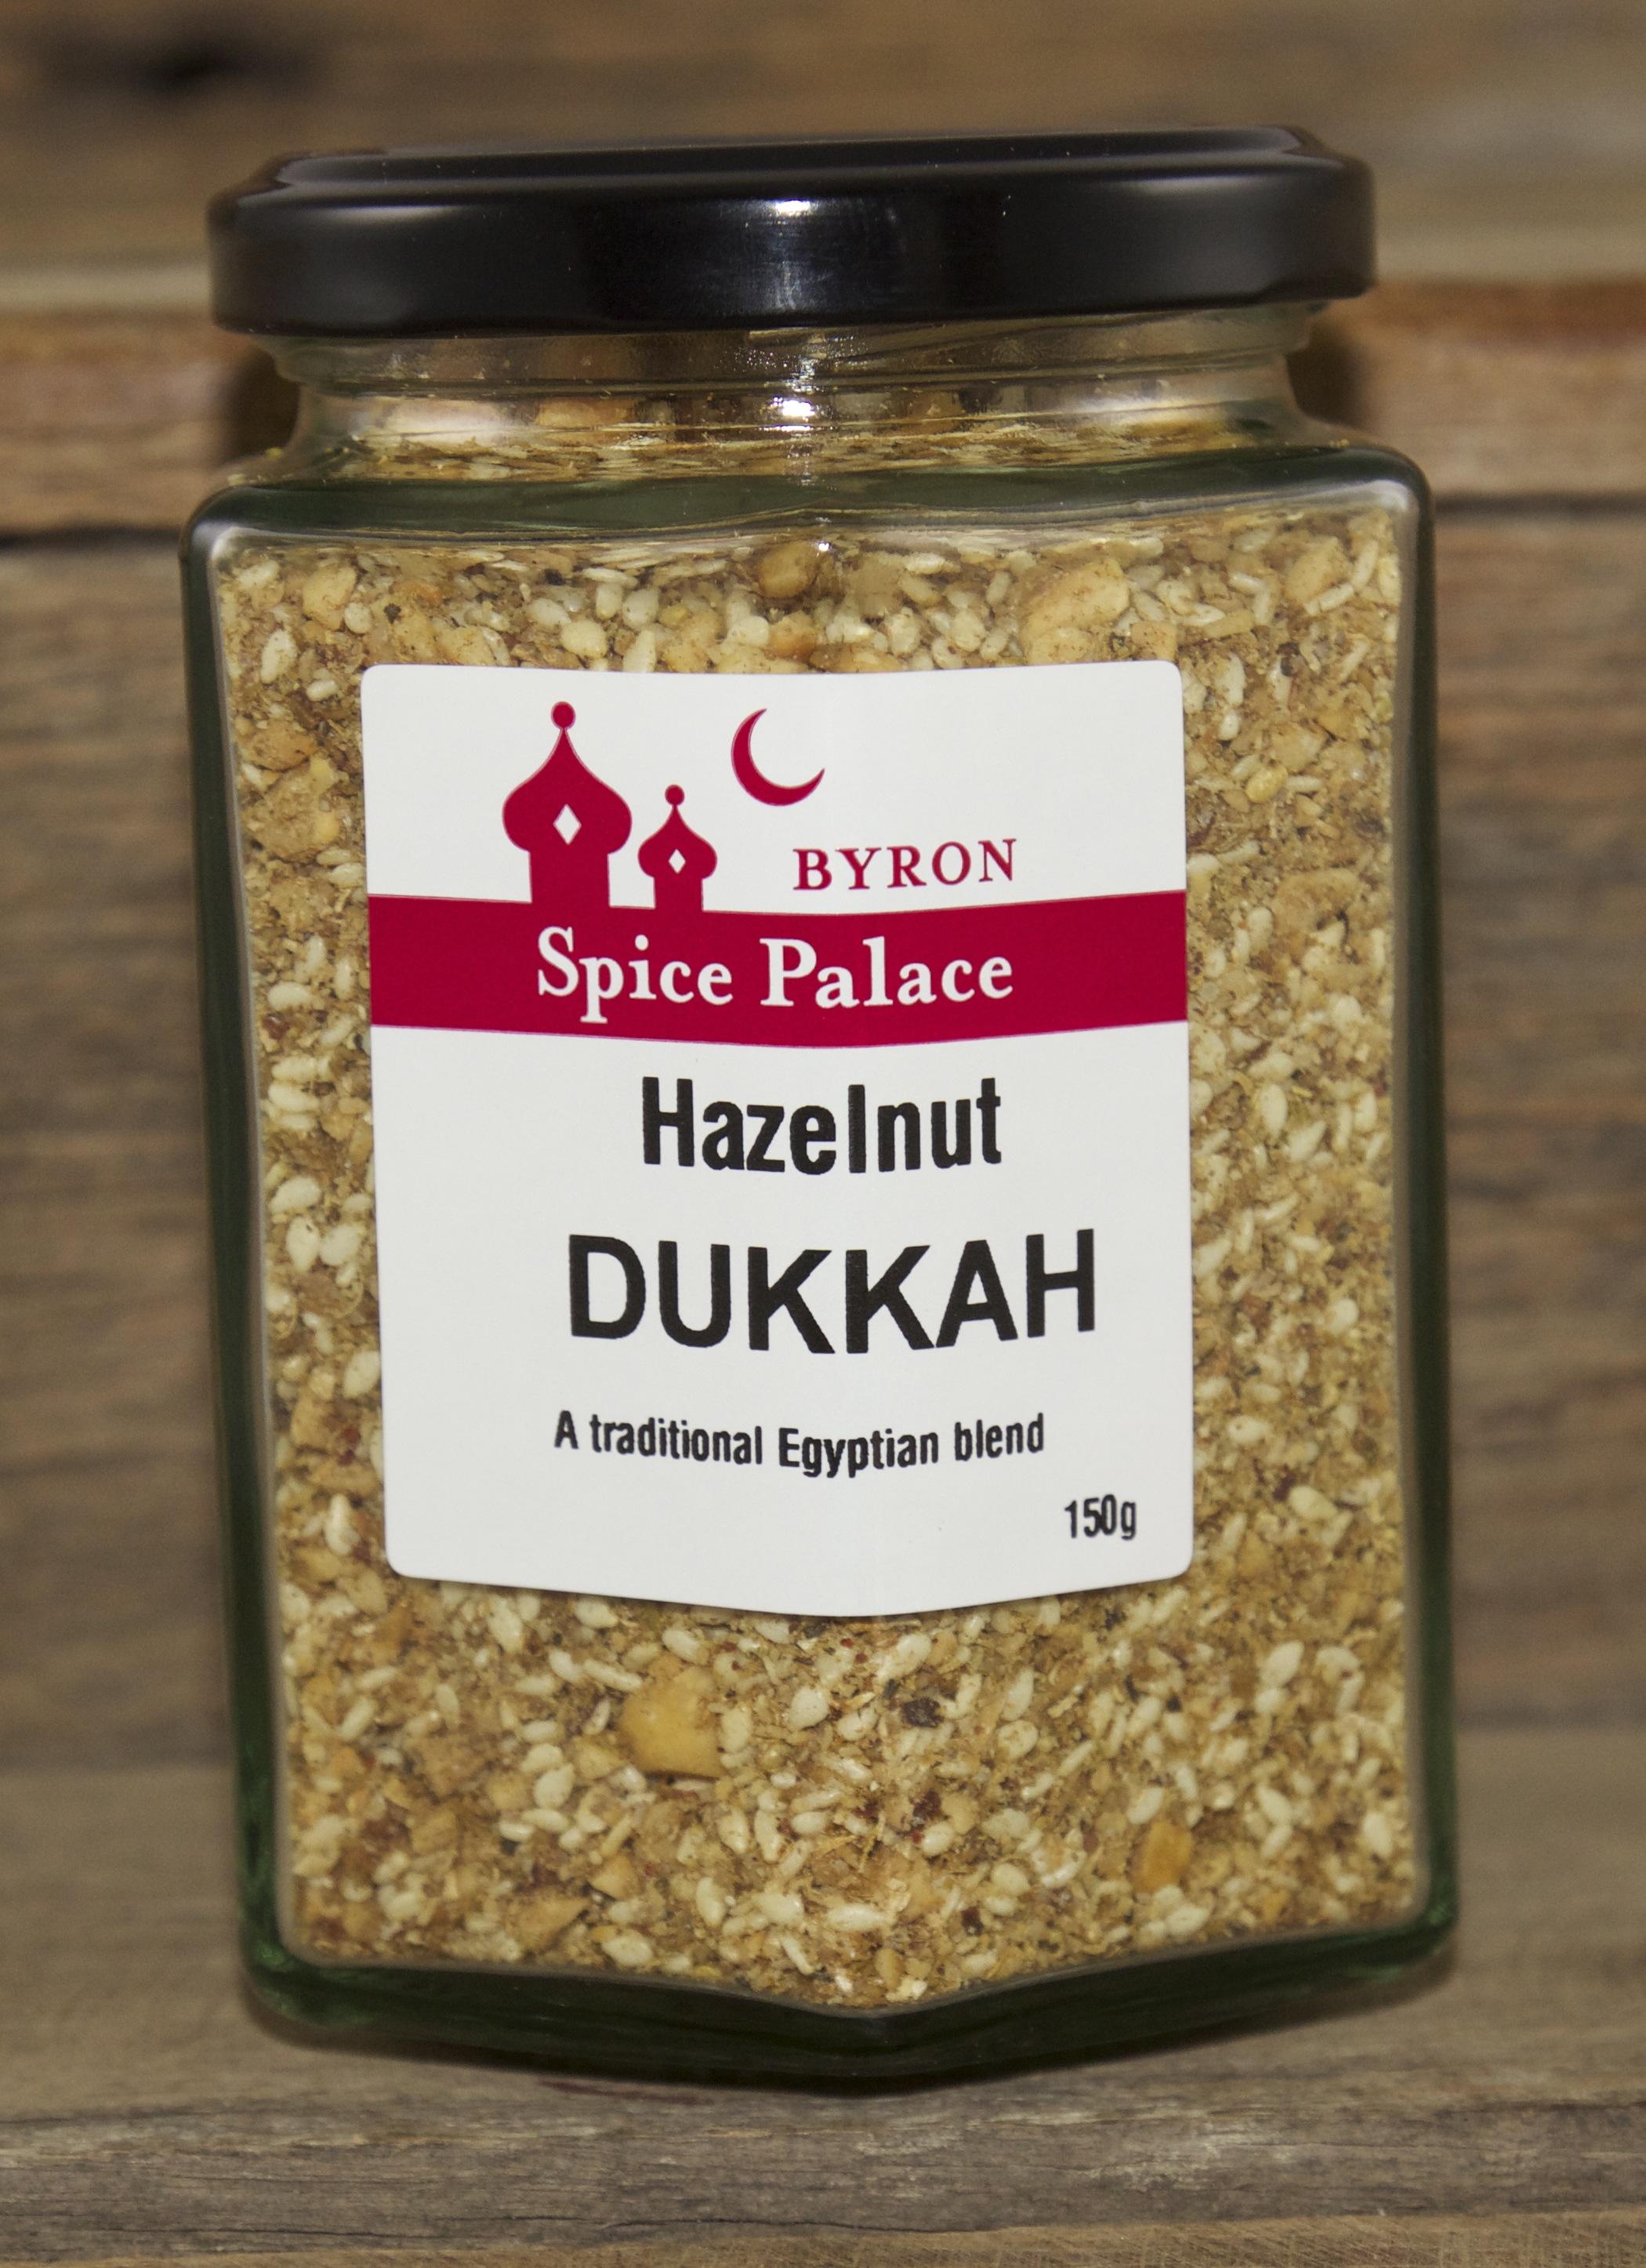 Dukkah with Hazelnuts - Spice Palace